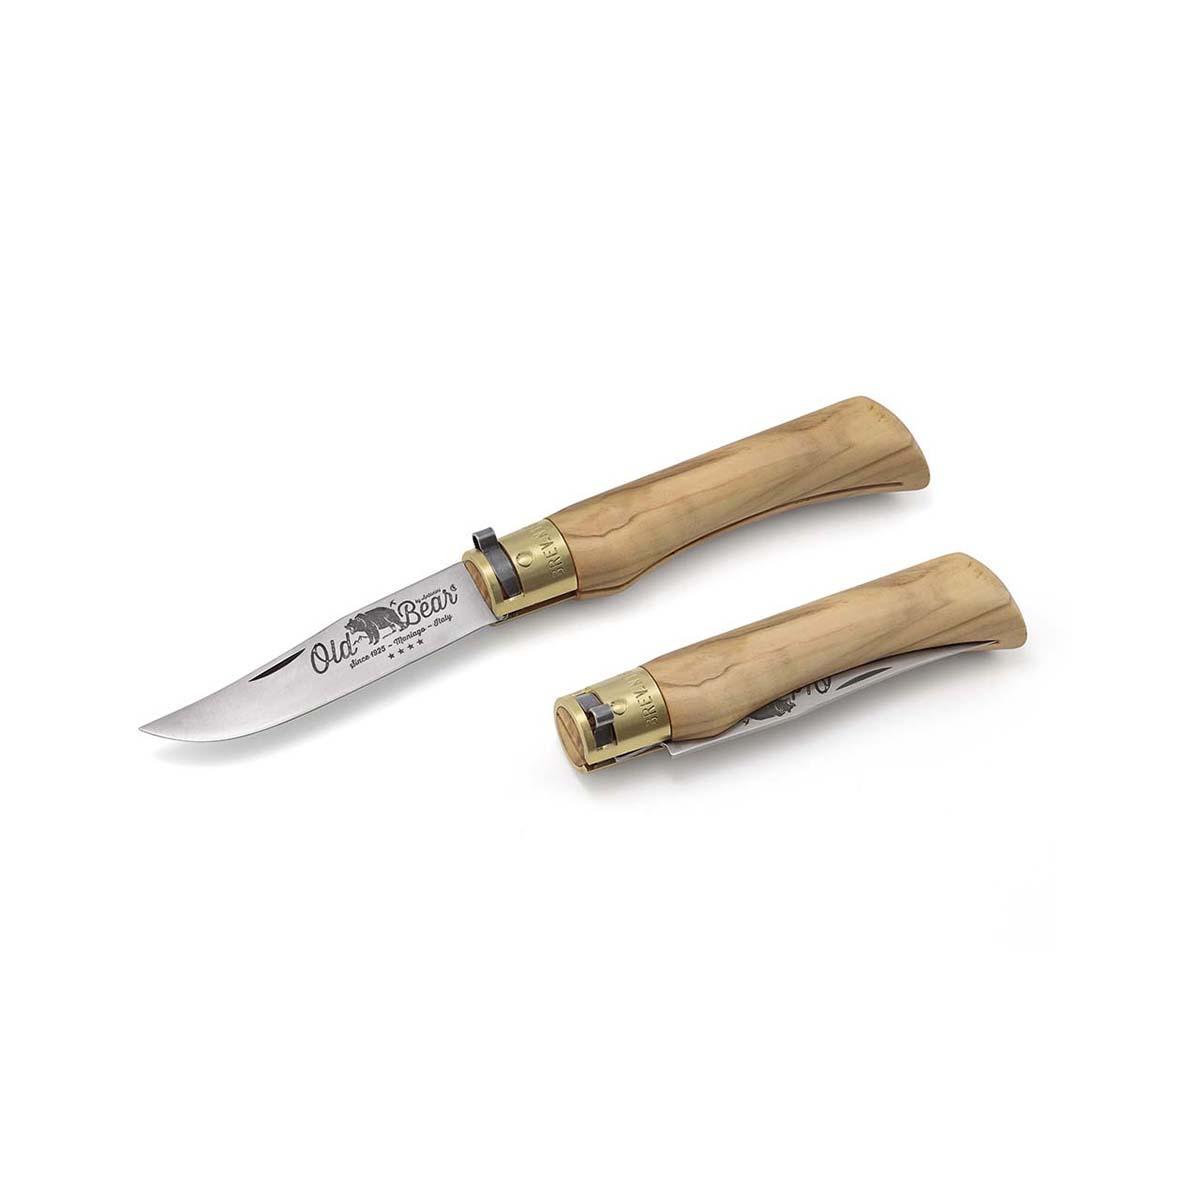 Нож складной Old Bear Antonini 930621LU Large 9 см